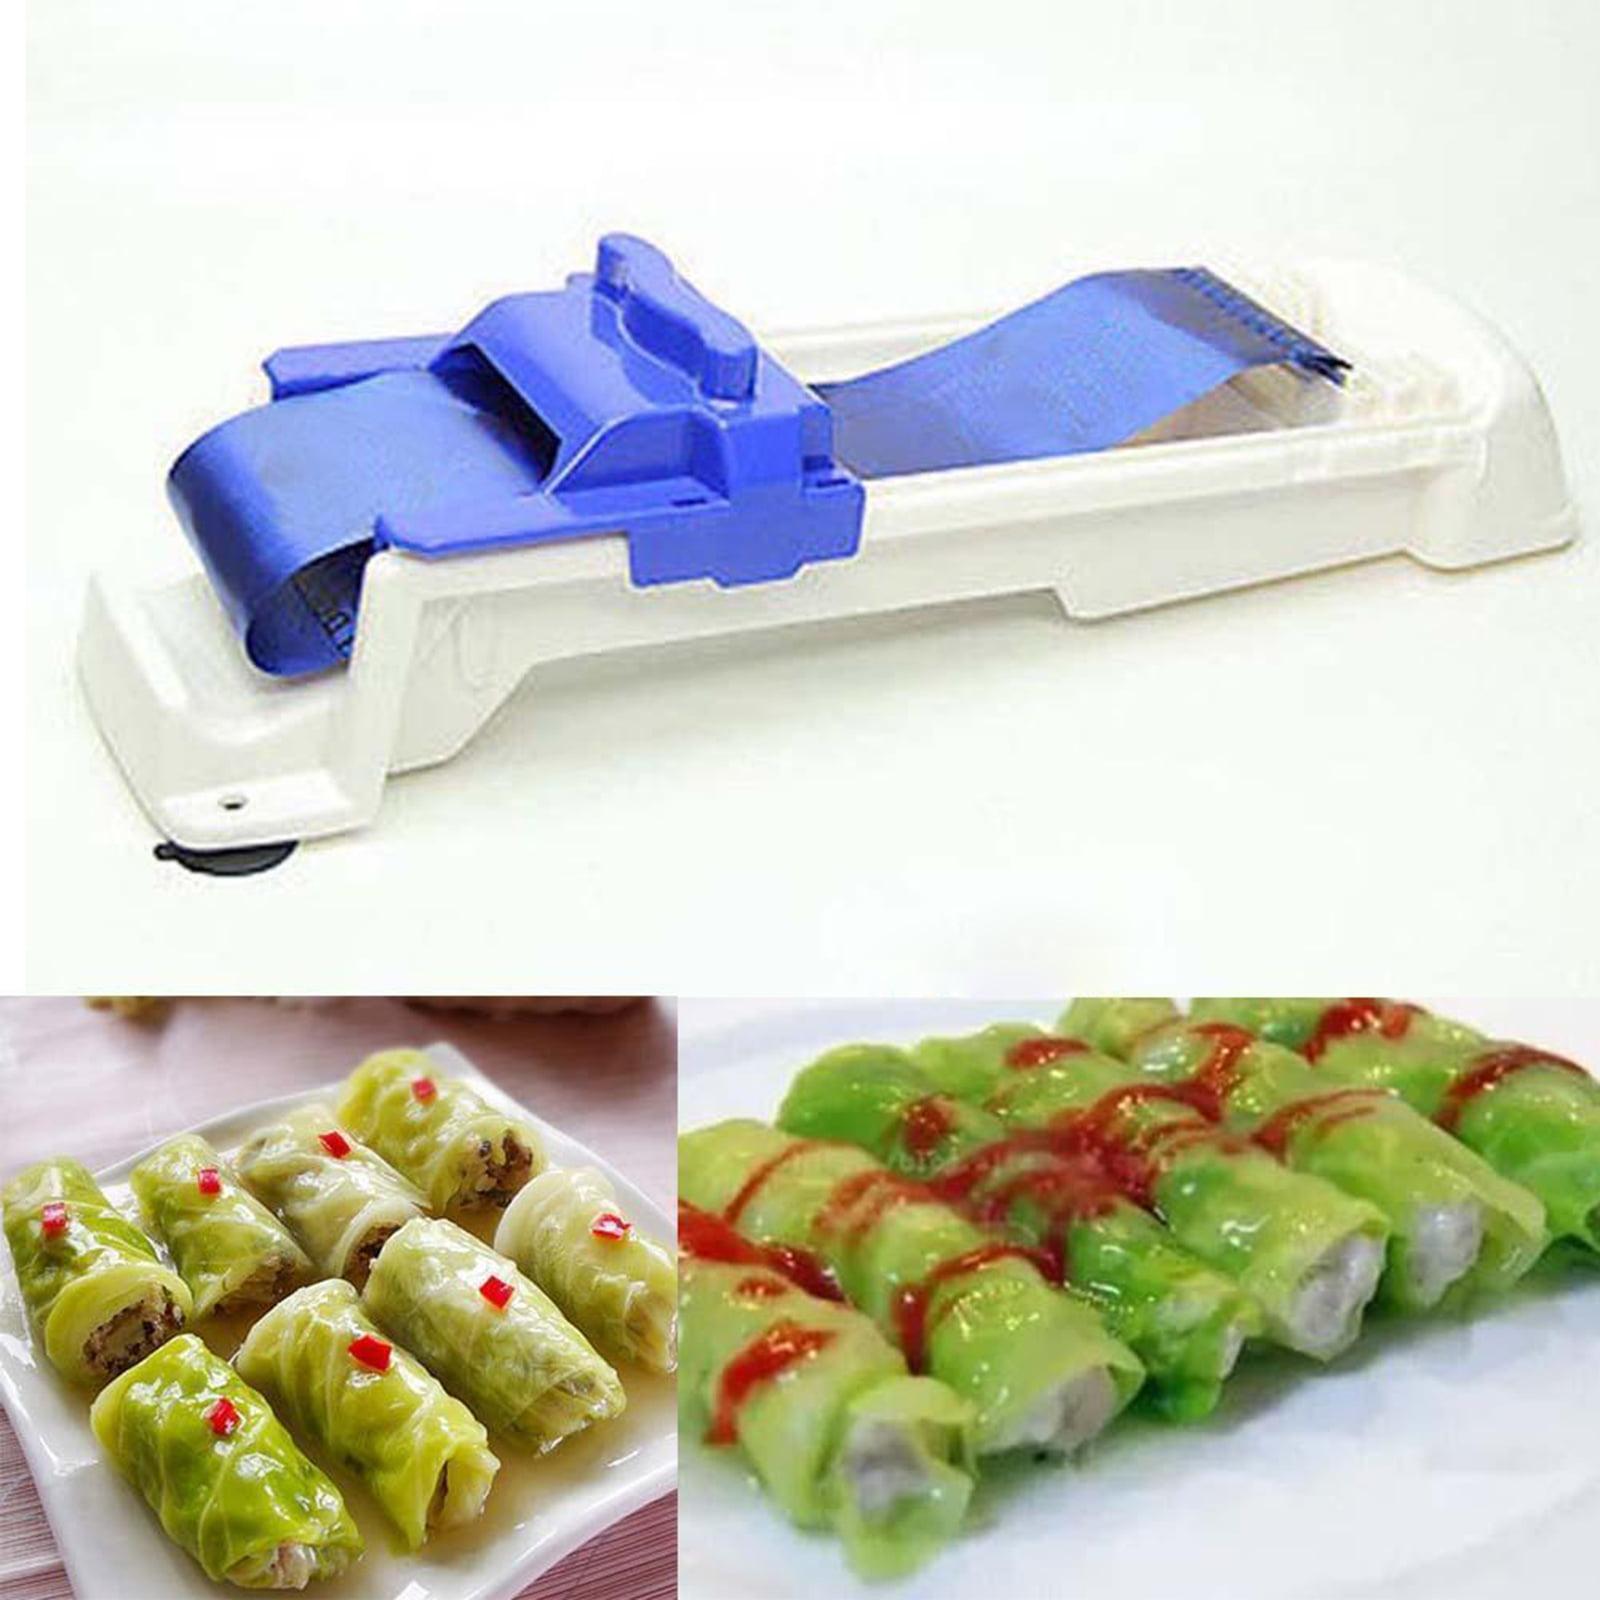 Sushi Rolling Tool Roller Magic Sushi Roller Stuffed Grape Cabbage Leave Grape Leaf Machine Magic Vegetable Meat Roller